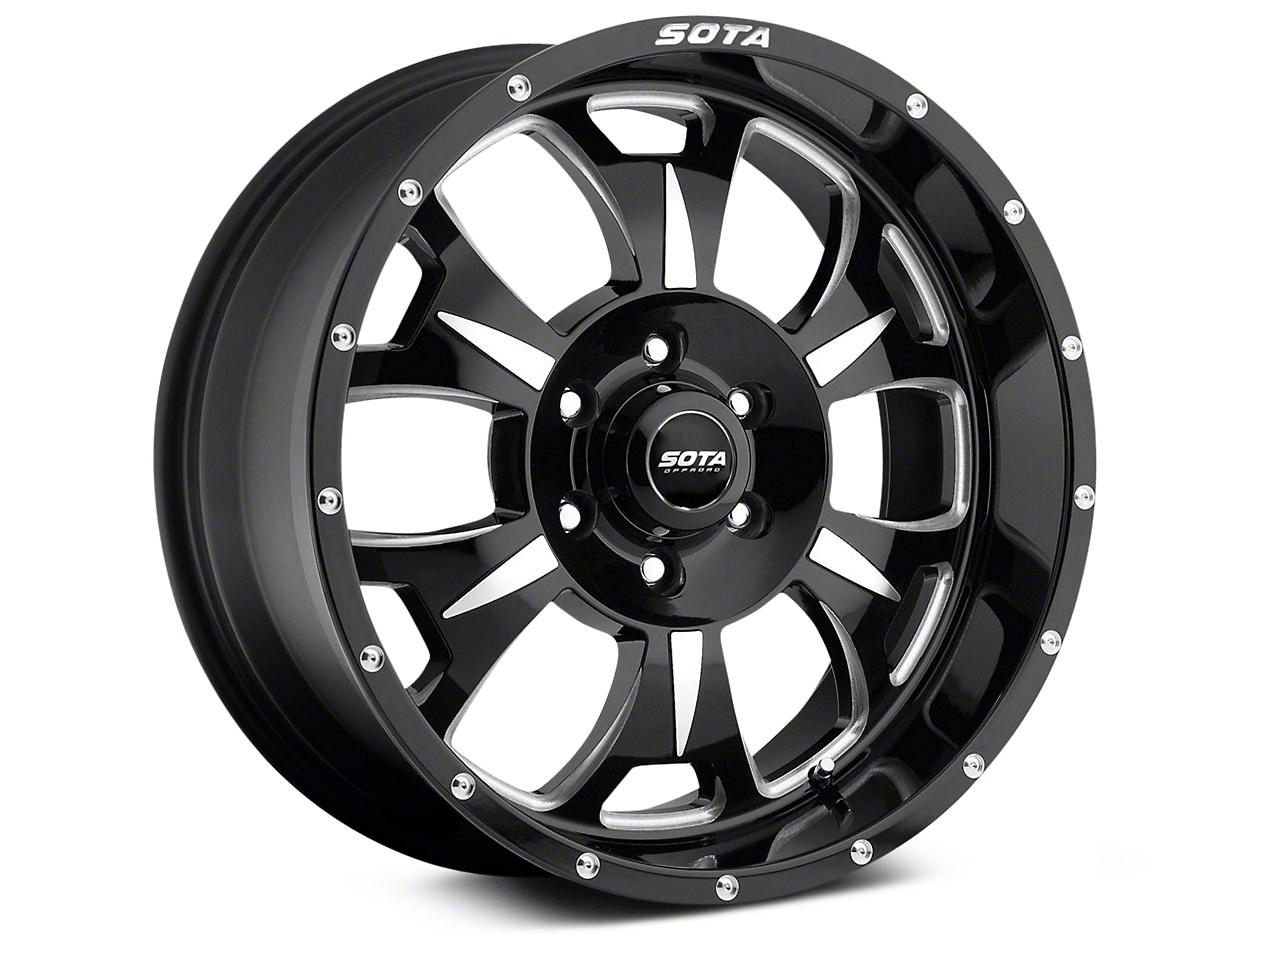 SOTA Off Road M-80 Death Metal 6-Lug Wheel - 20x9 (07-18 Sierra 1500)